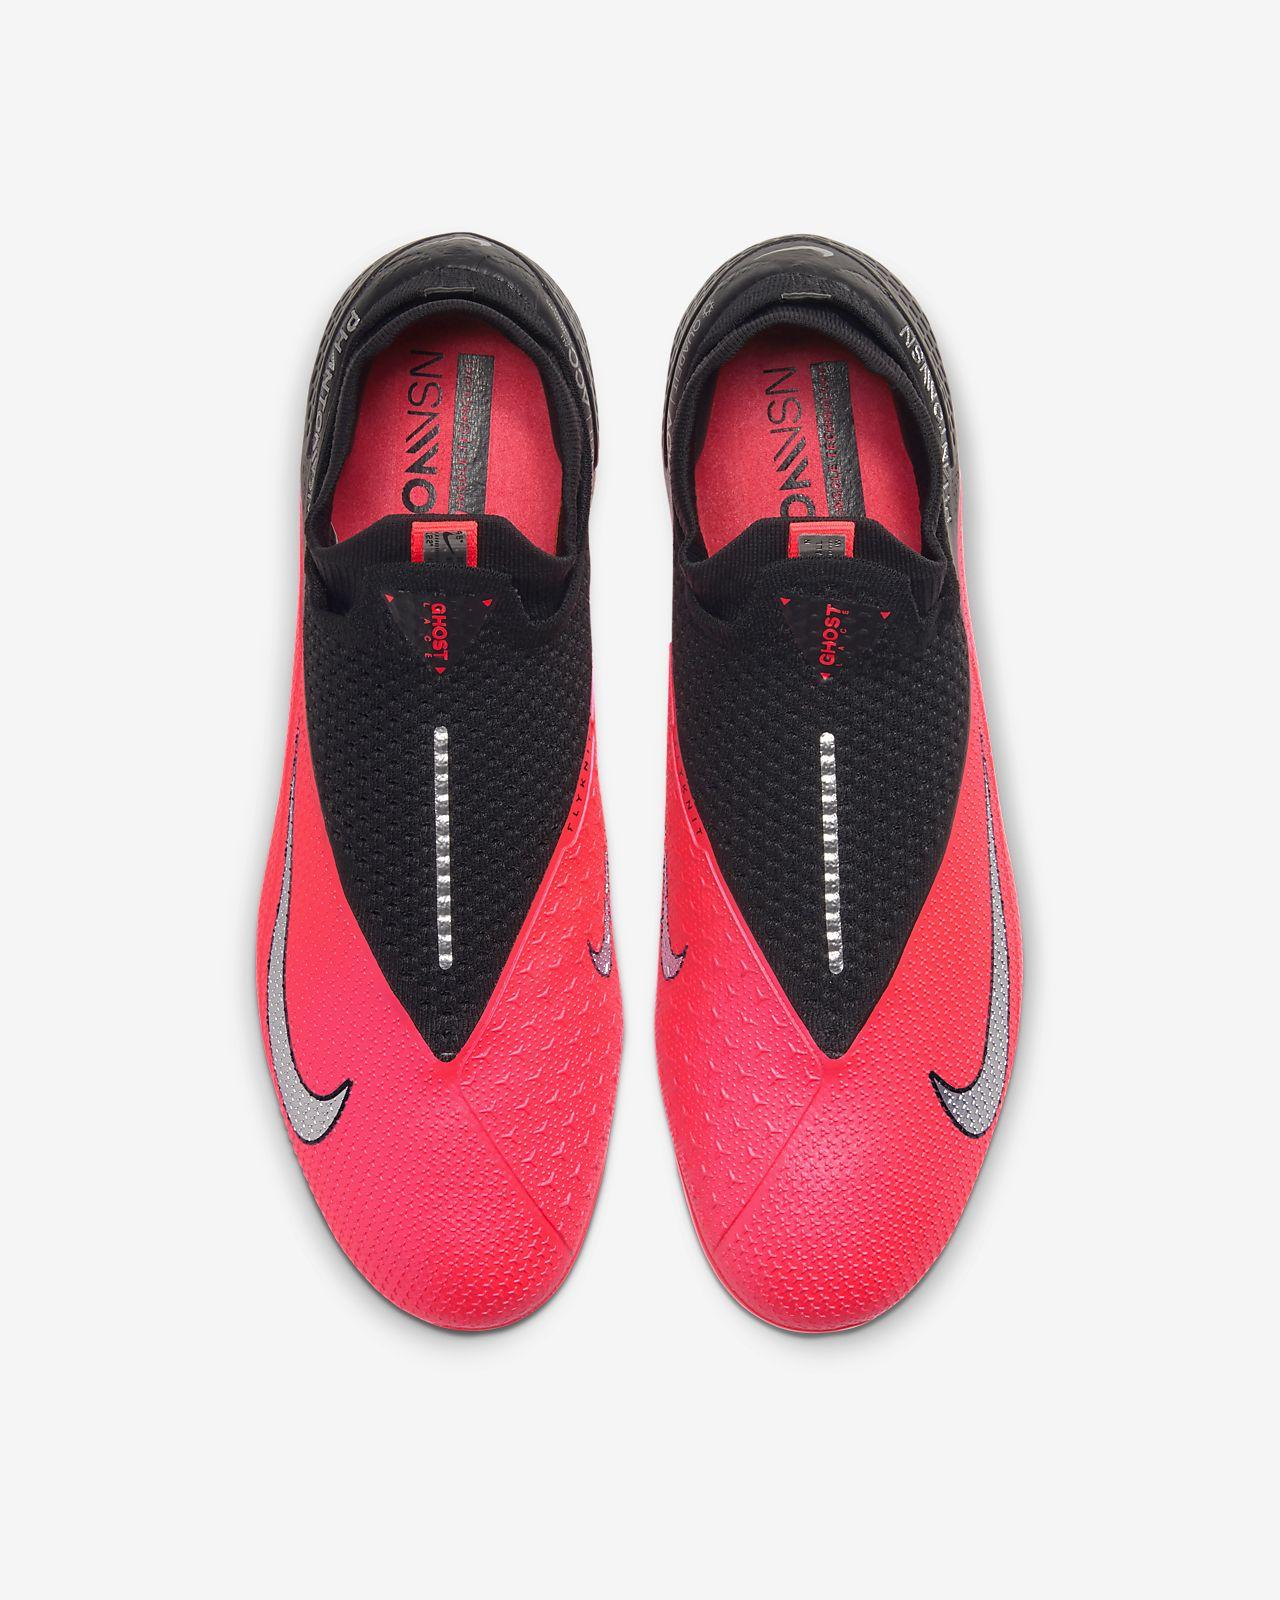 Nike Phantom VSN Elite Dynamic Fit SE FG Jordan